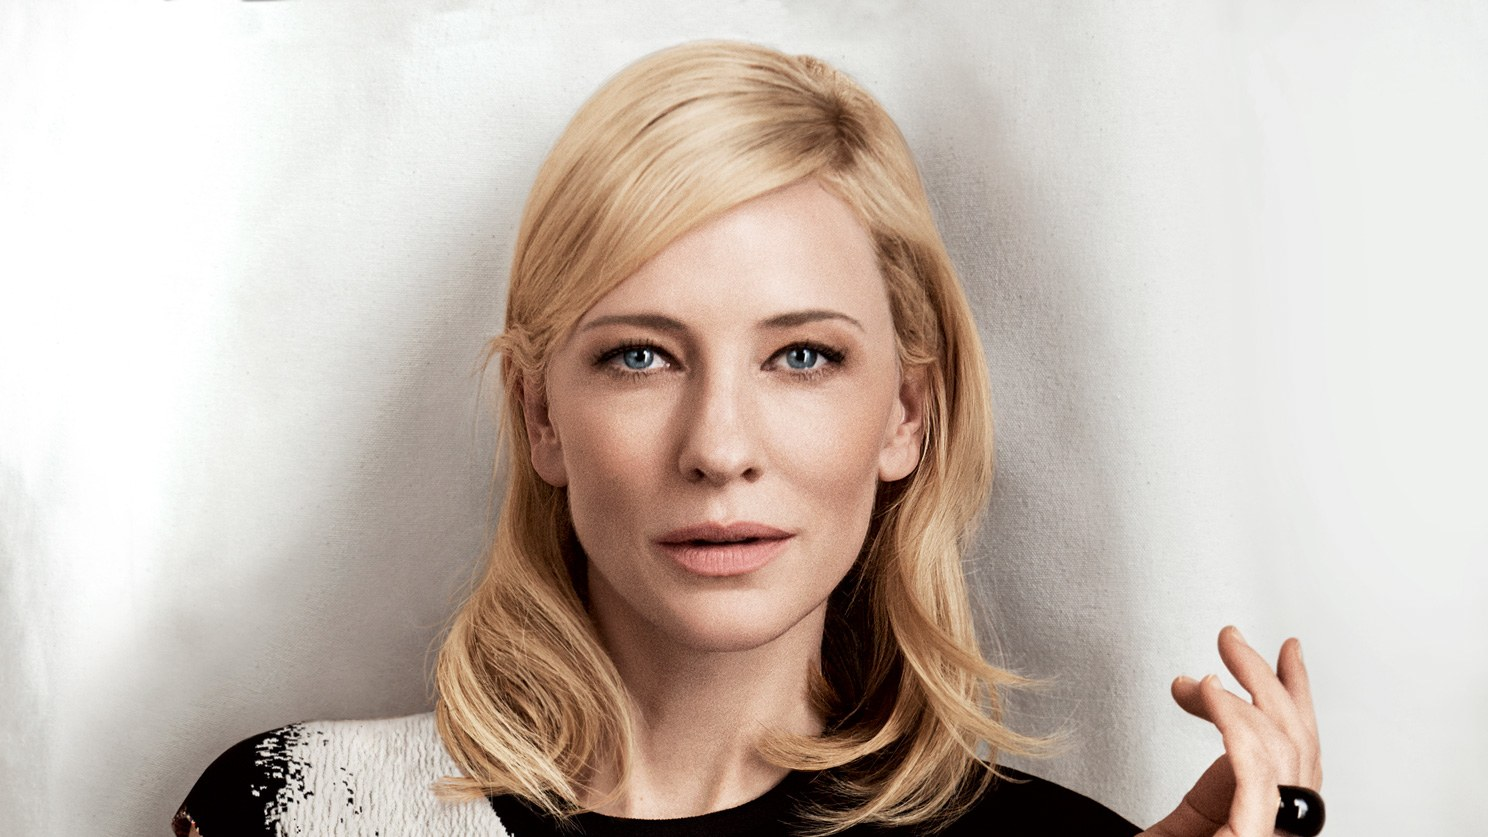 Cate Blanchett, φωτογραφία του Craig McDean, Vogue, 2014